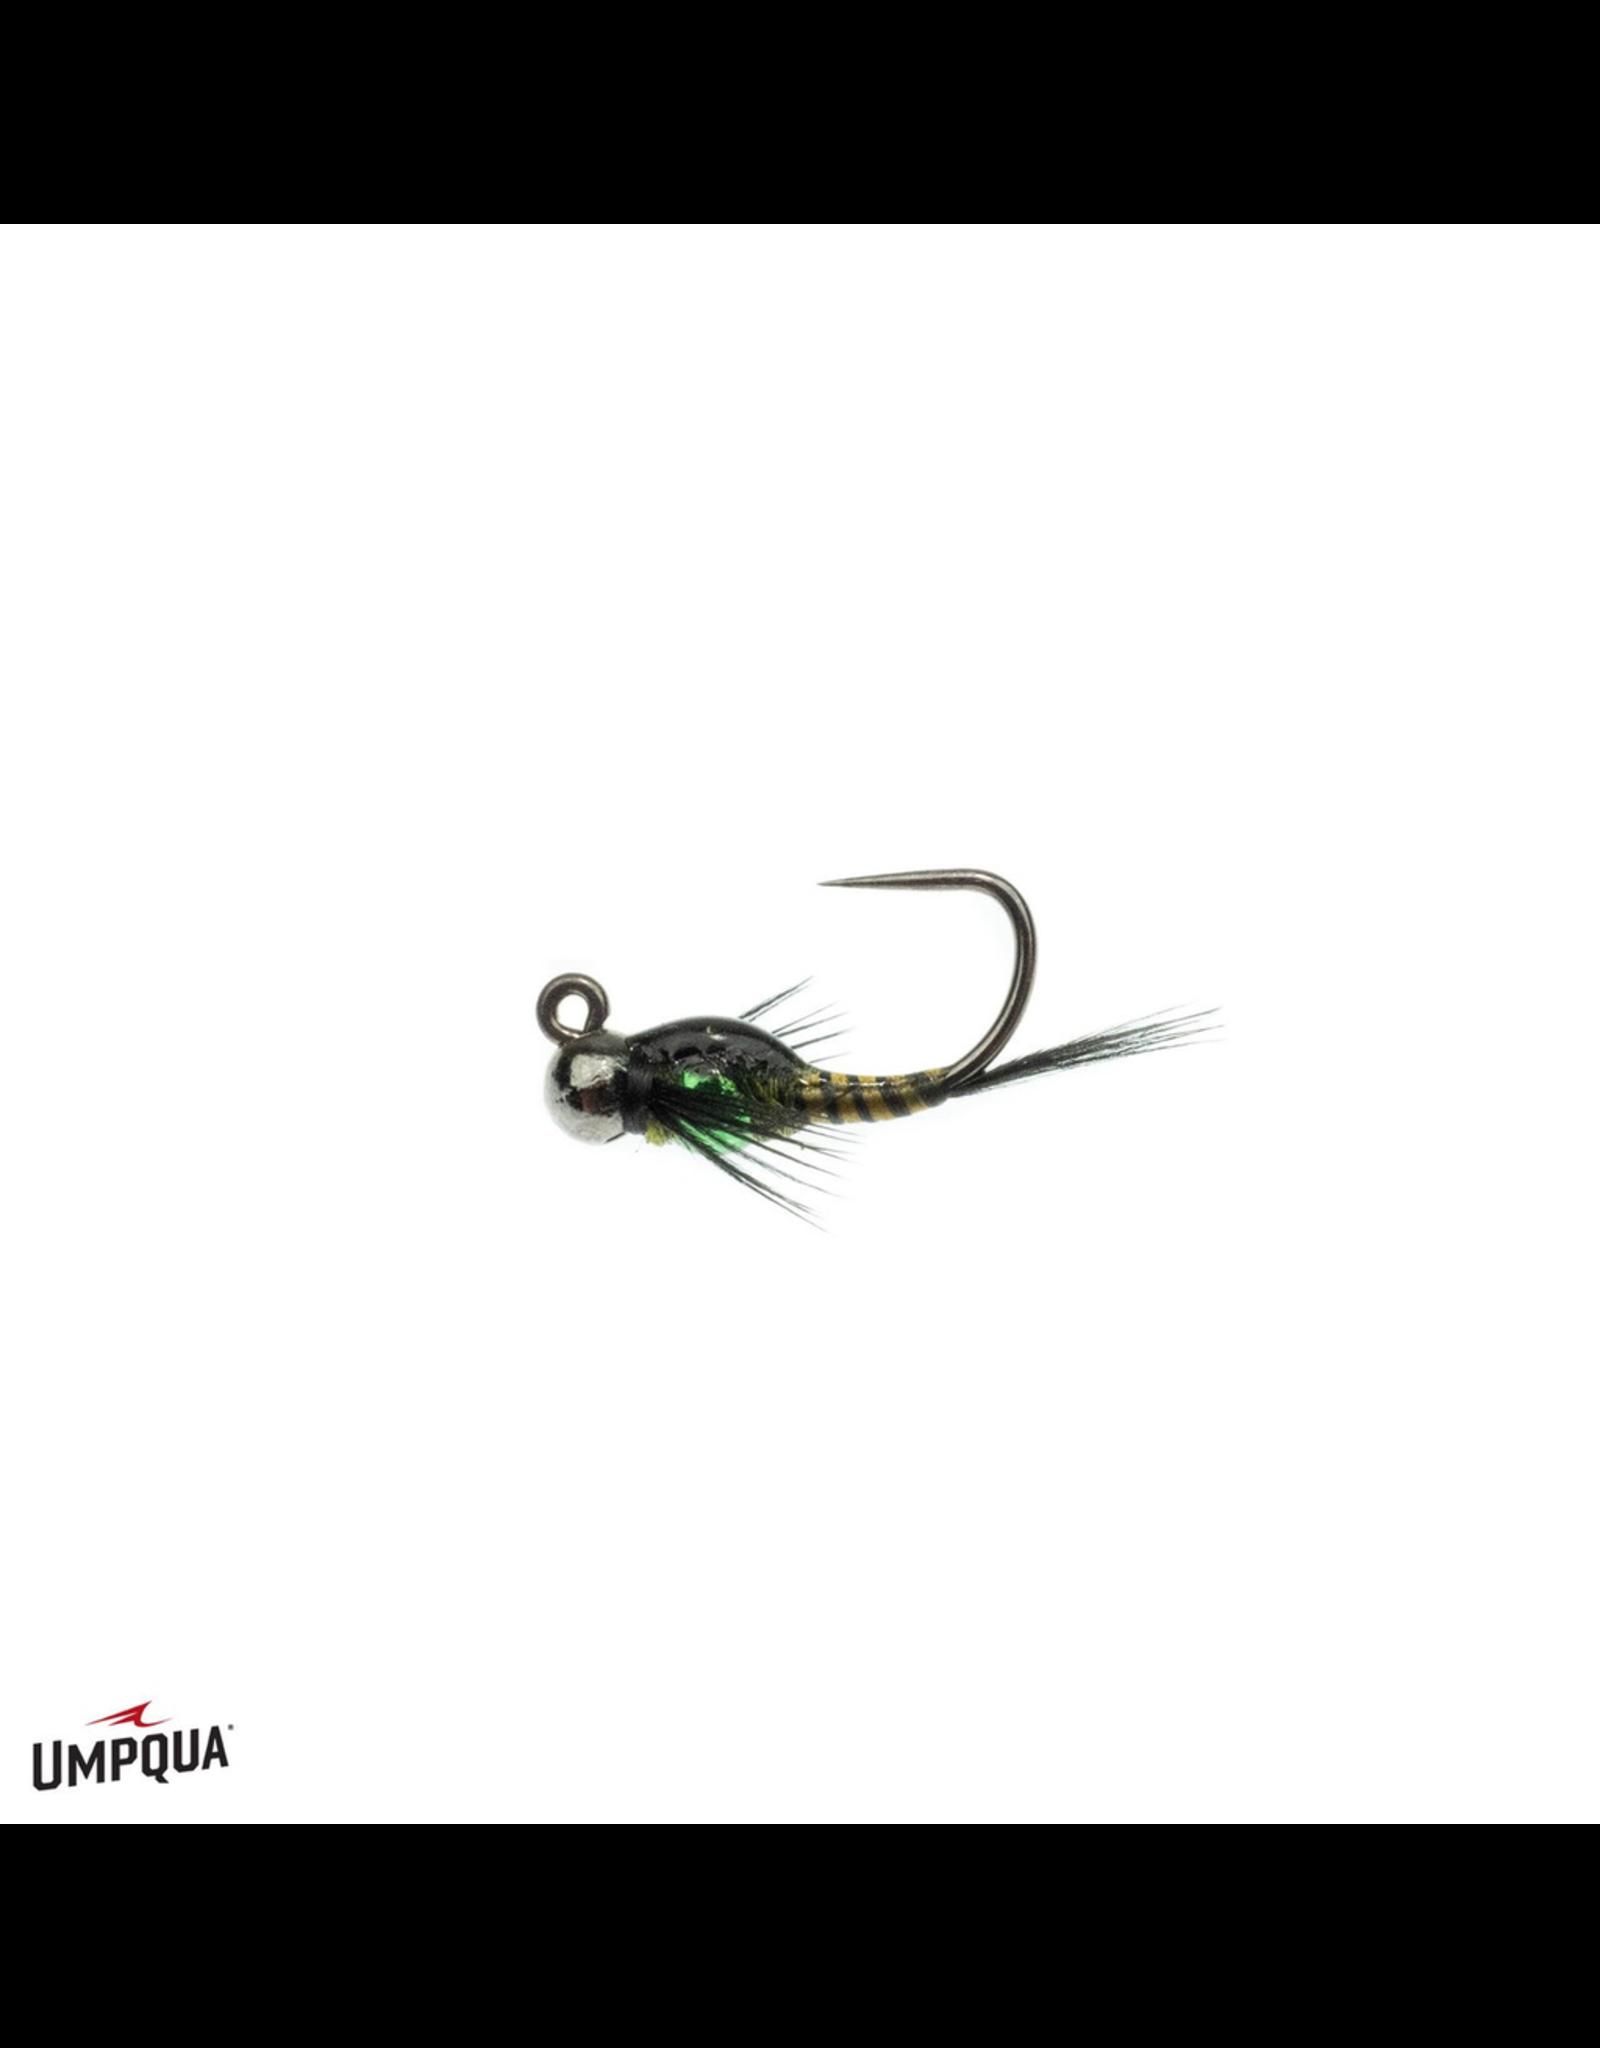 Umpqua Two Bit Hooker Jigged Olive (3 Pack)